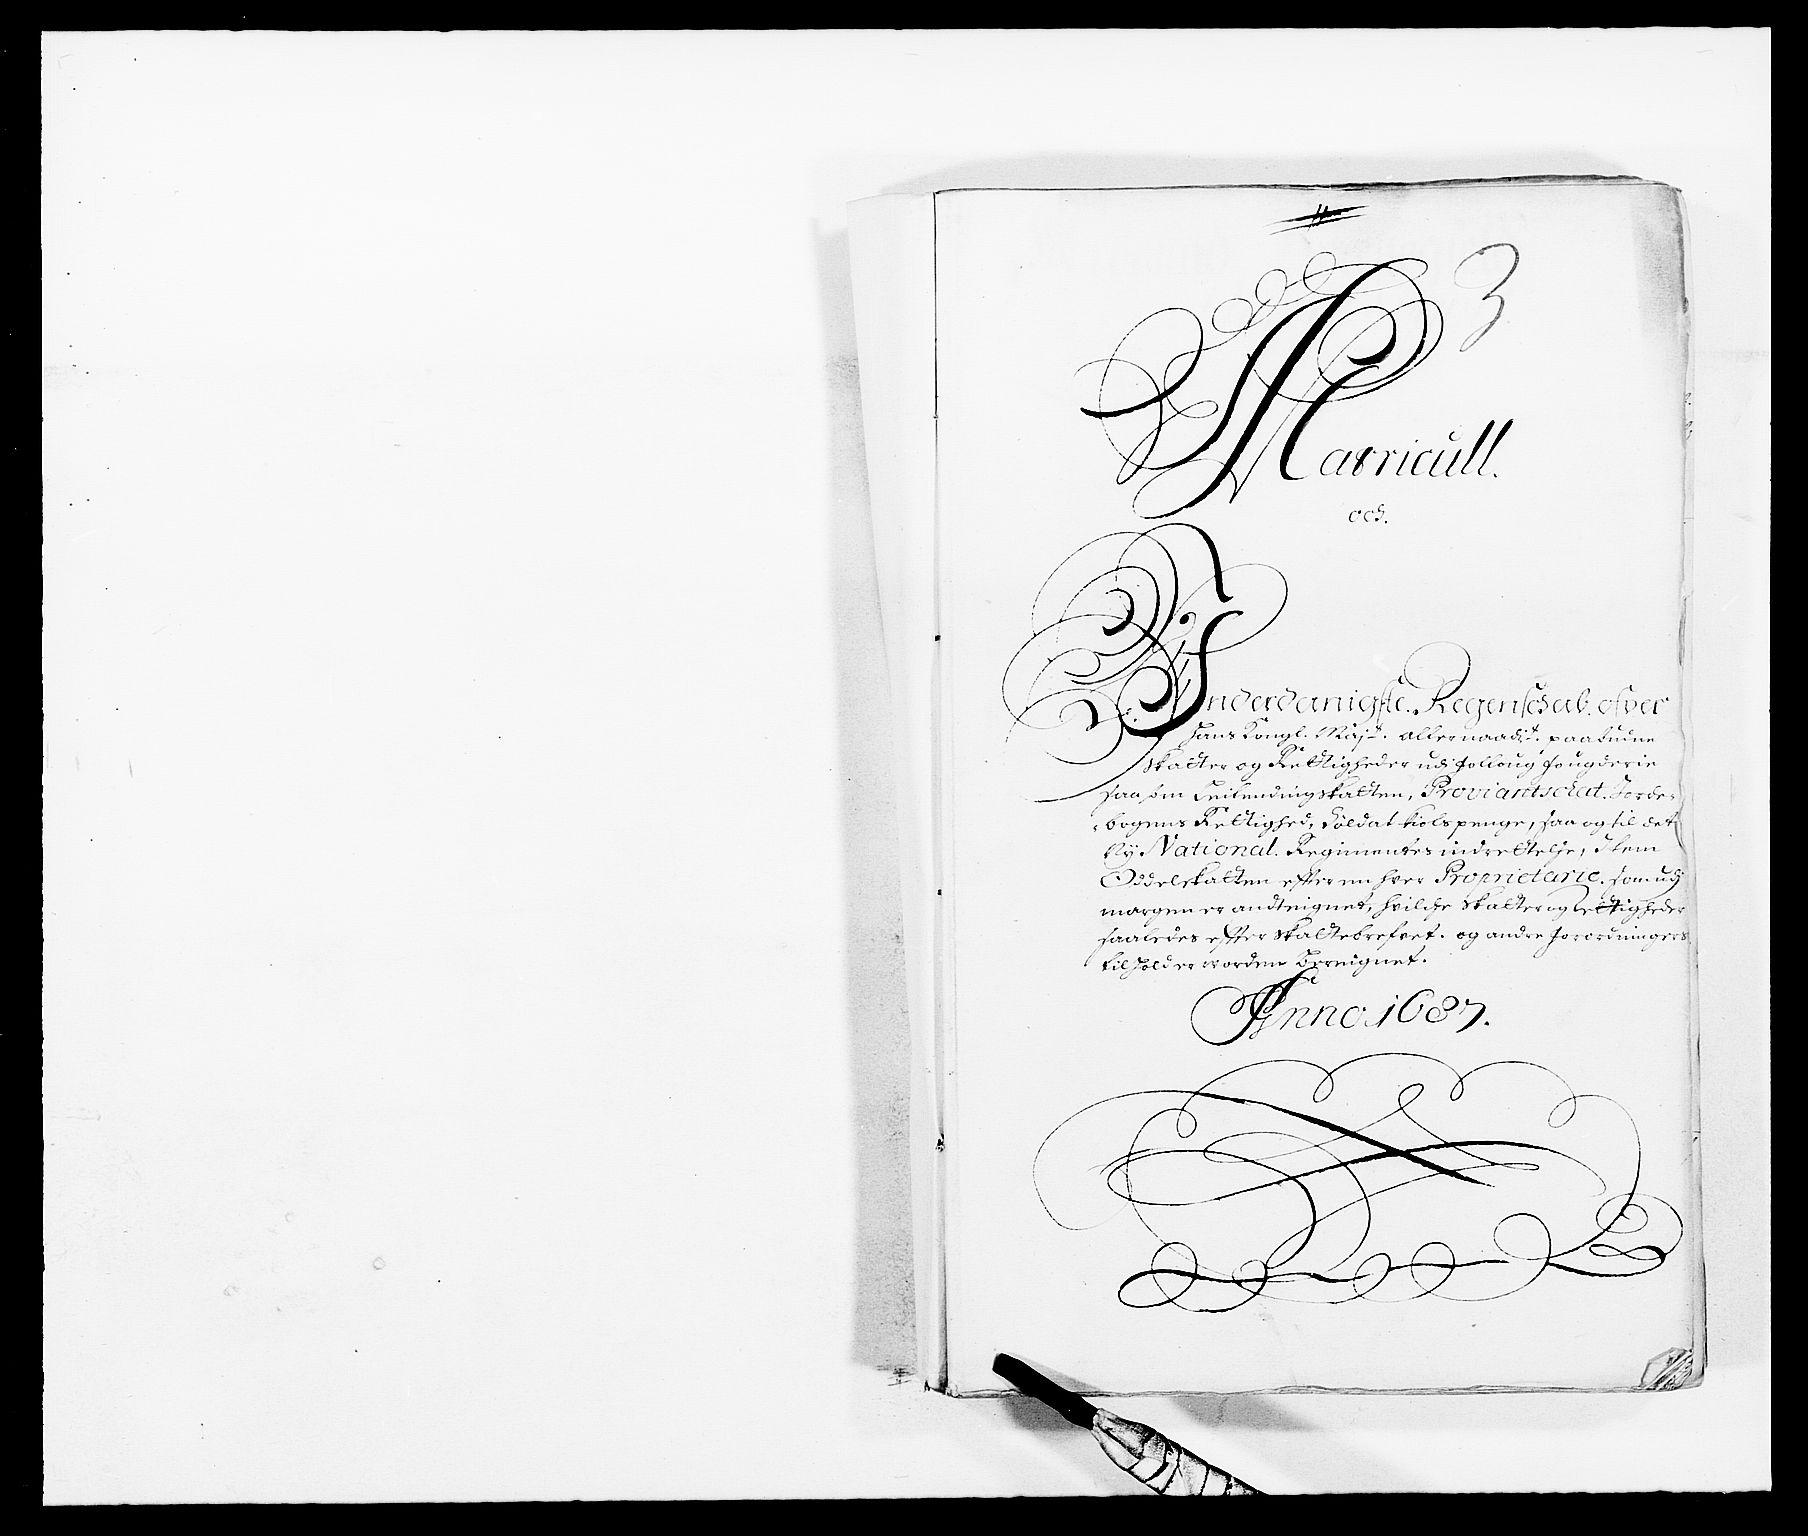 RA, Rentekammeret inntil 1814, Reviderte regnskaper, Fogderegnskap, R09/L0434: Fogderegnskap Follo, 1687-1688, s. 17